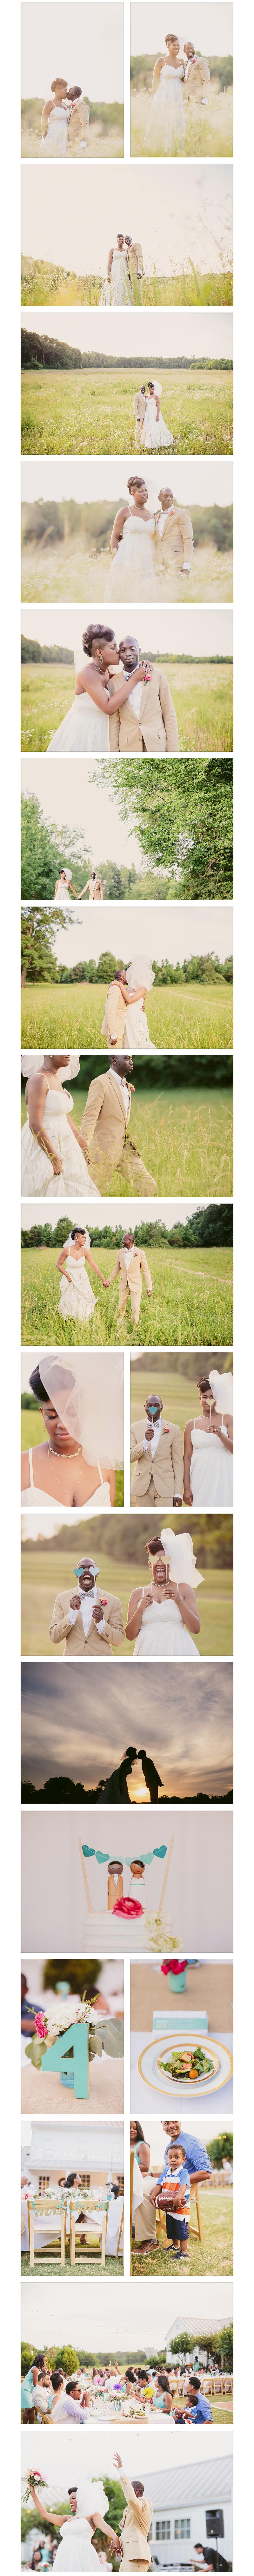 atlanta farm wedding 4.jpg